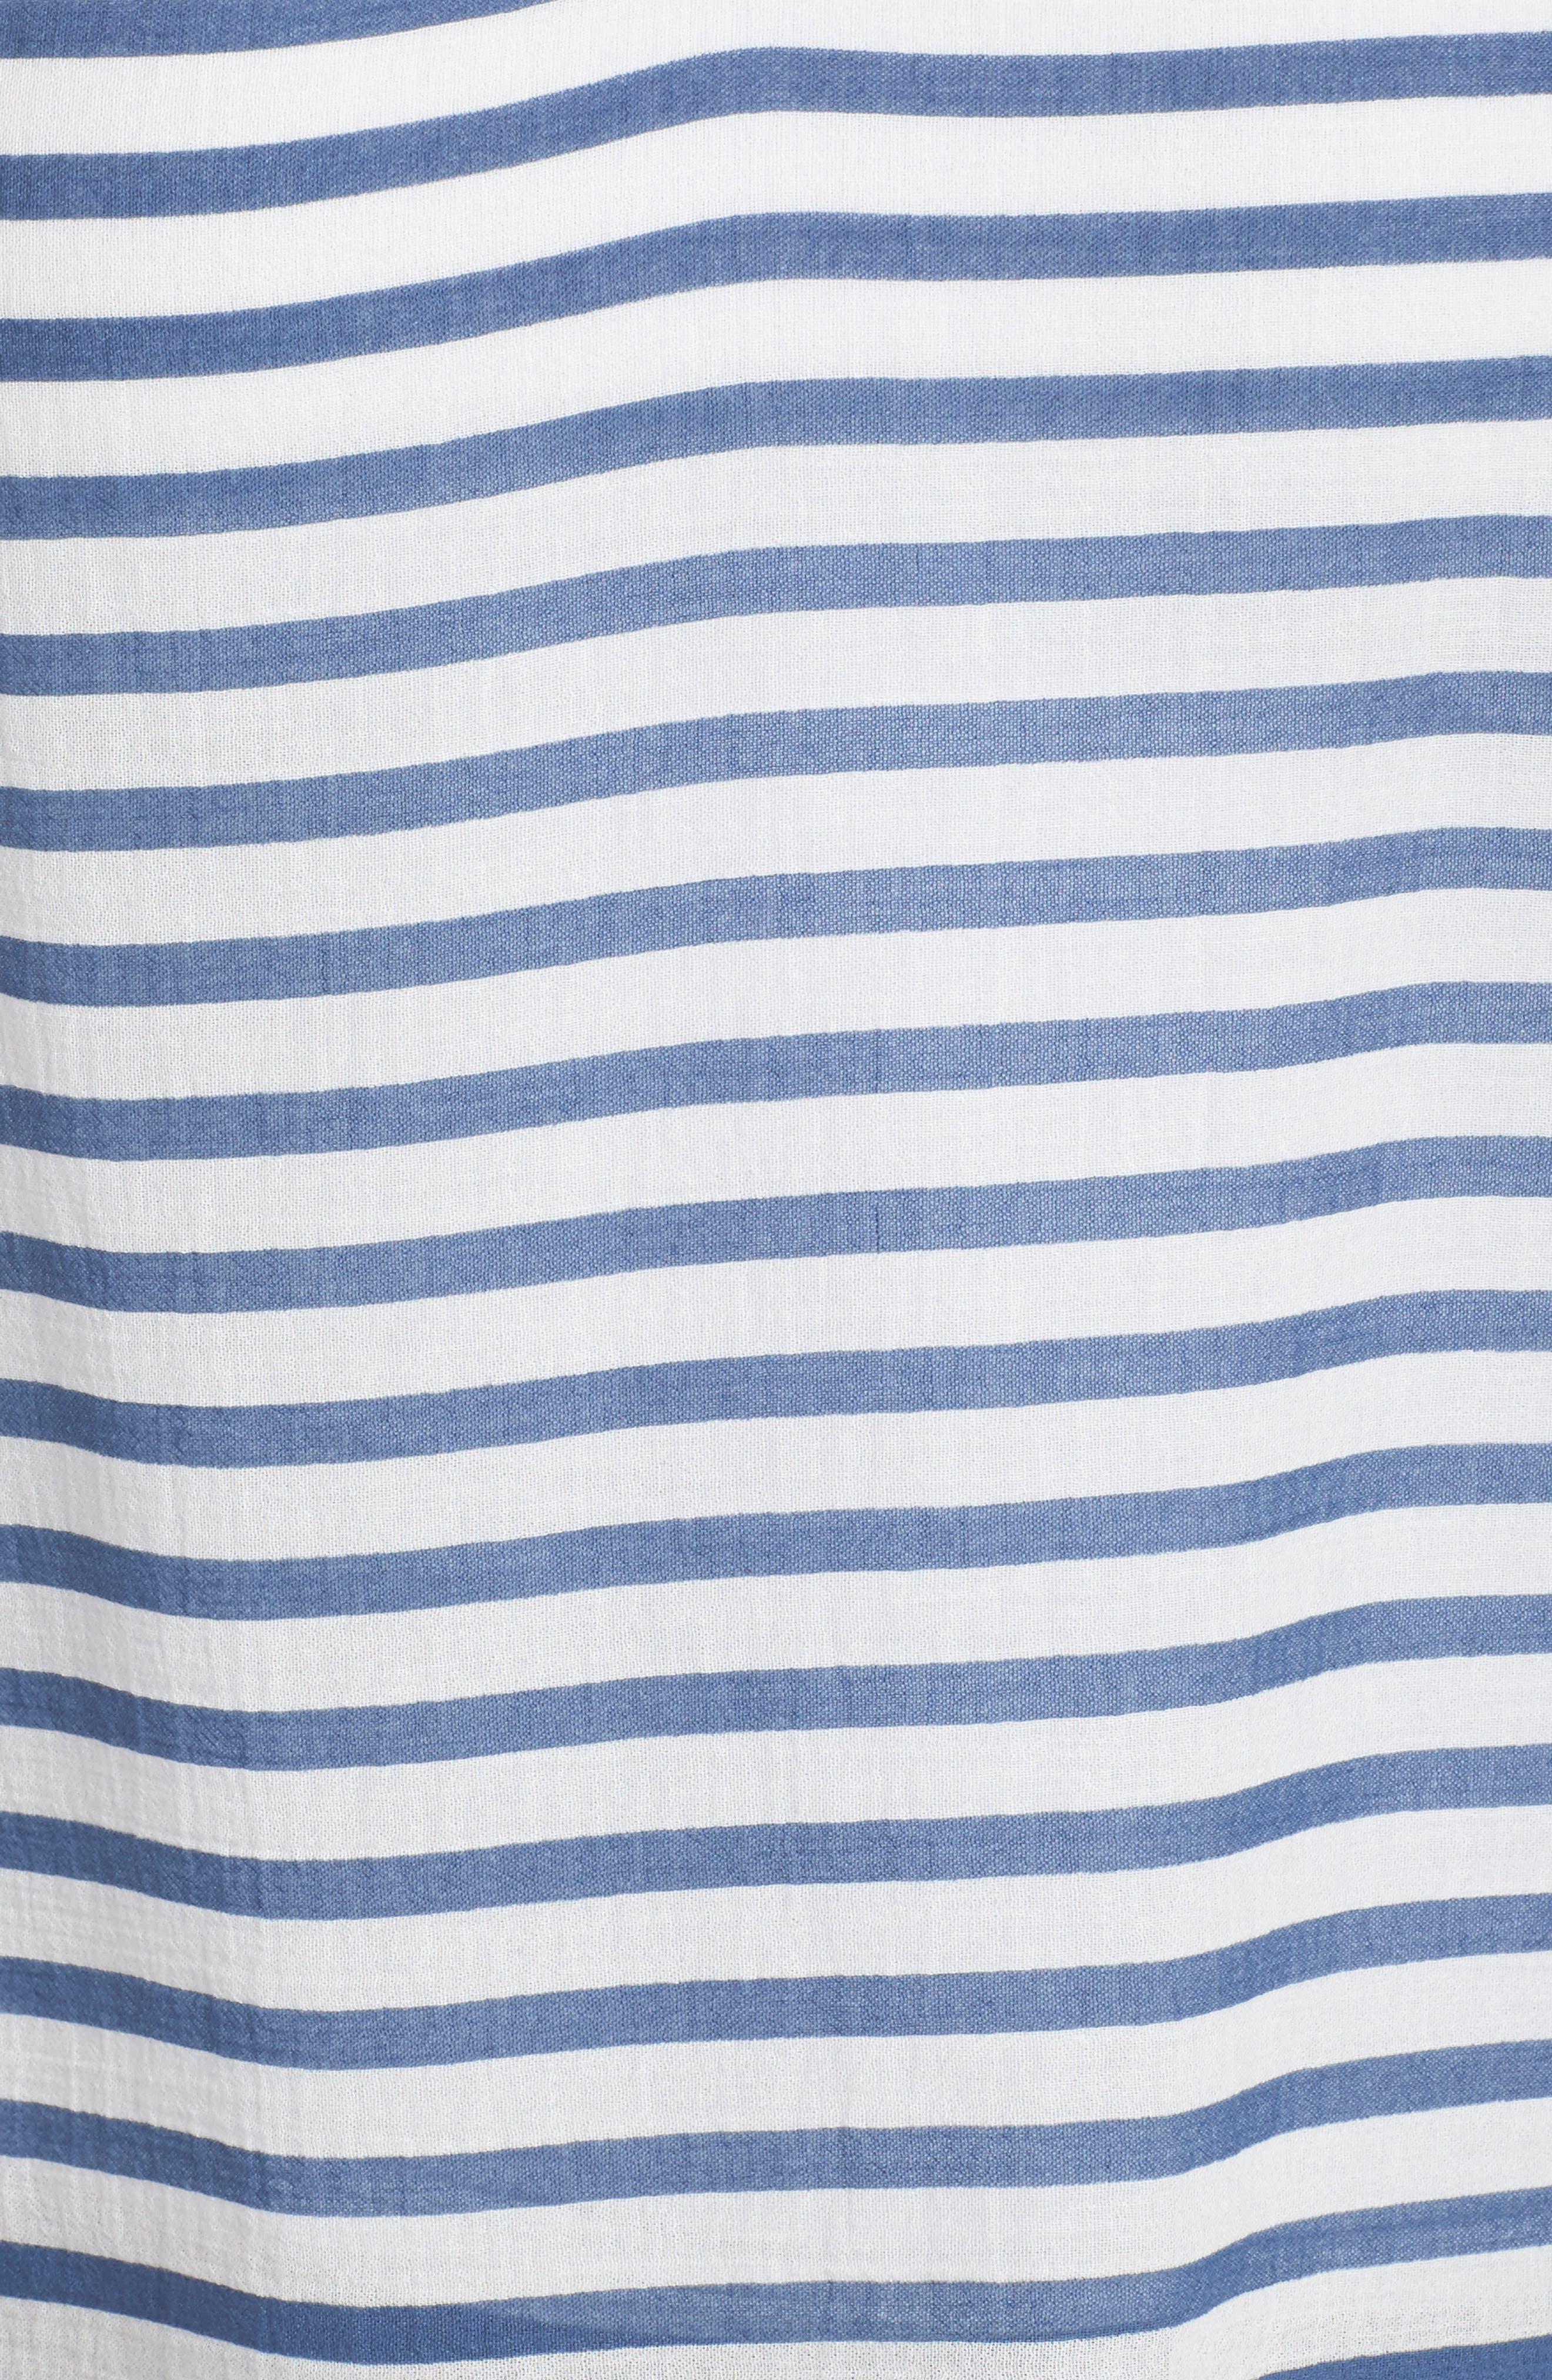 Stripe Peasant Blouse,                             Alternate thumbnail 5, color,                             Patina Blue